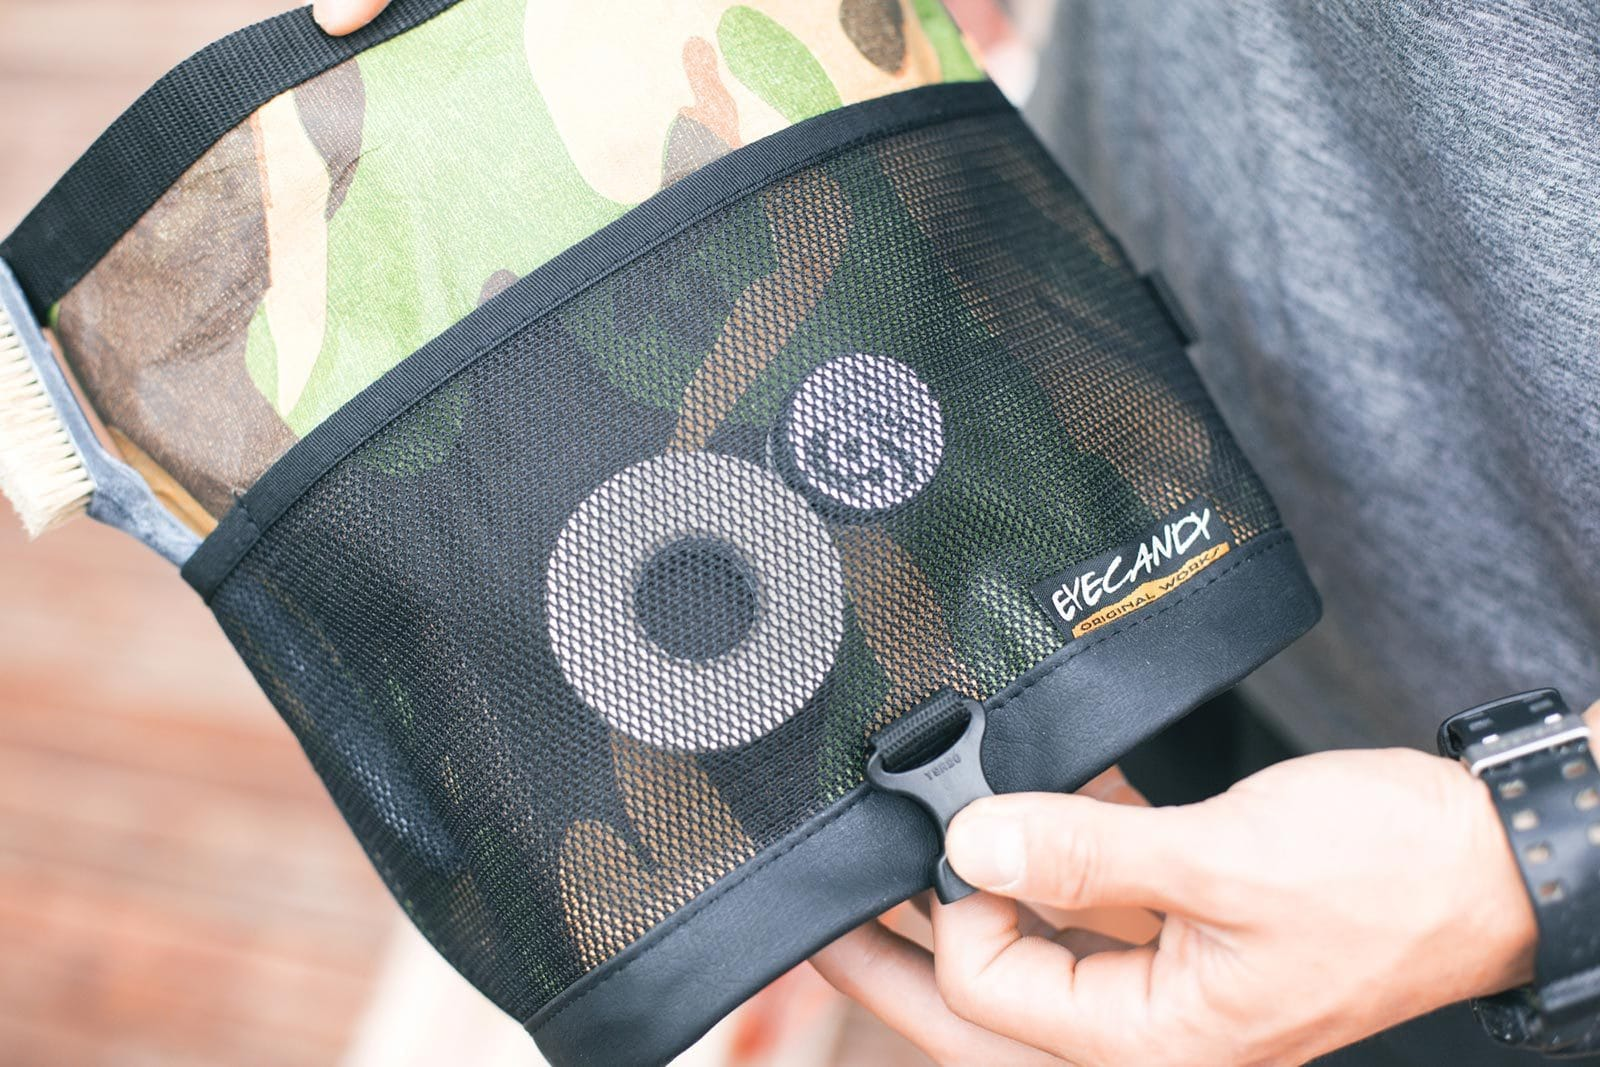 eyeCandy dual chalkbag